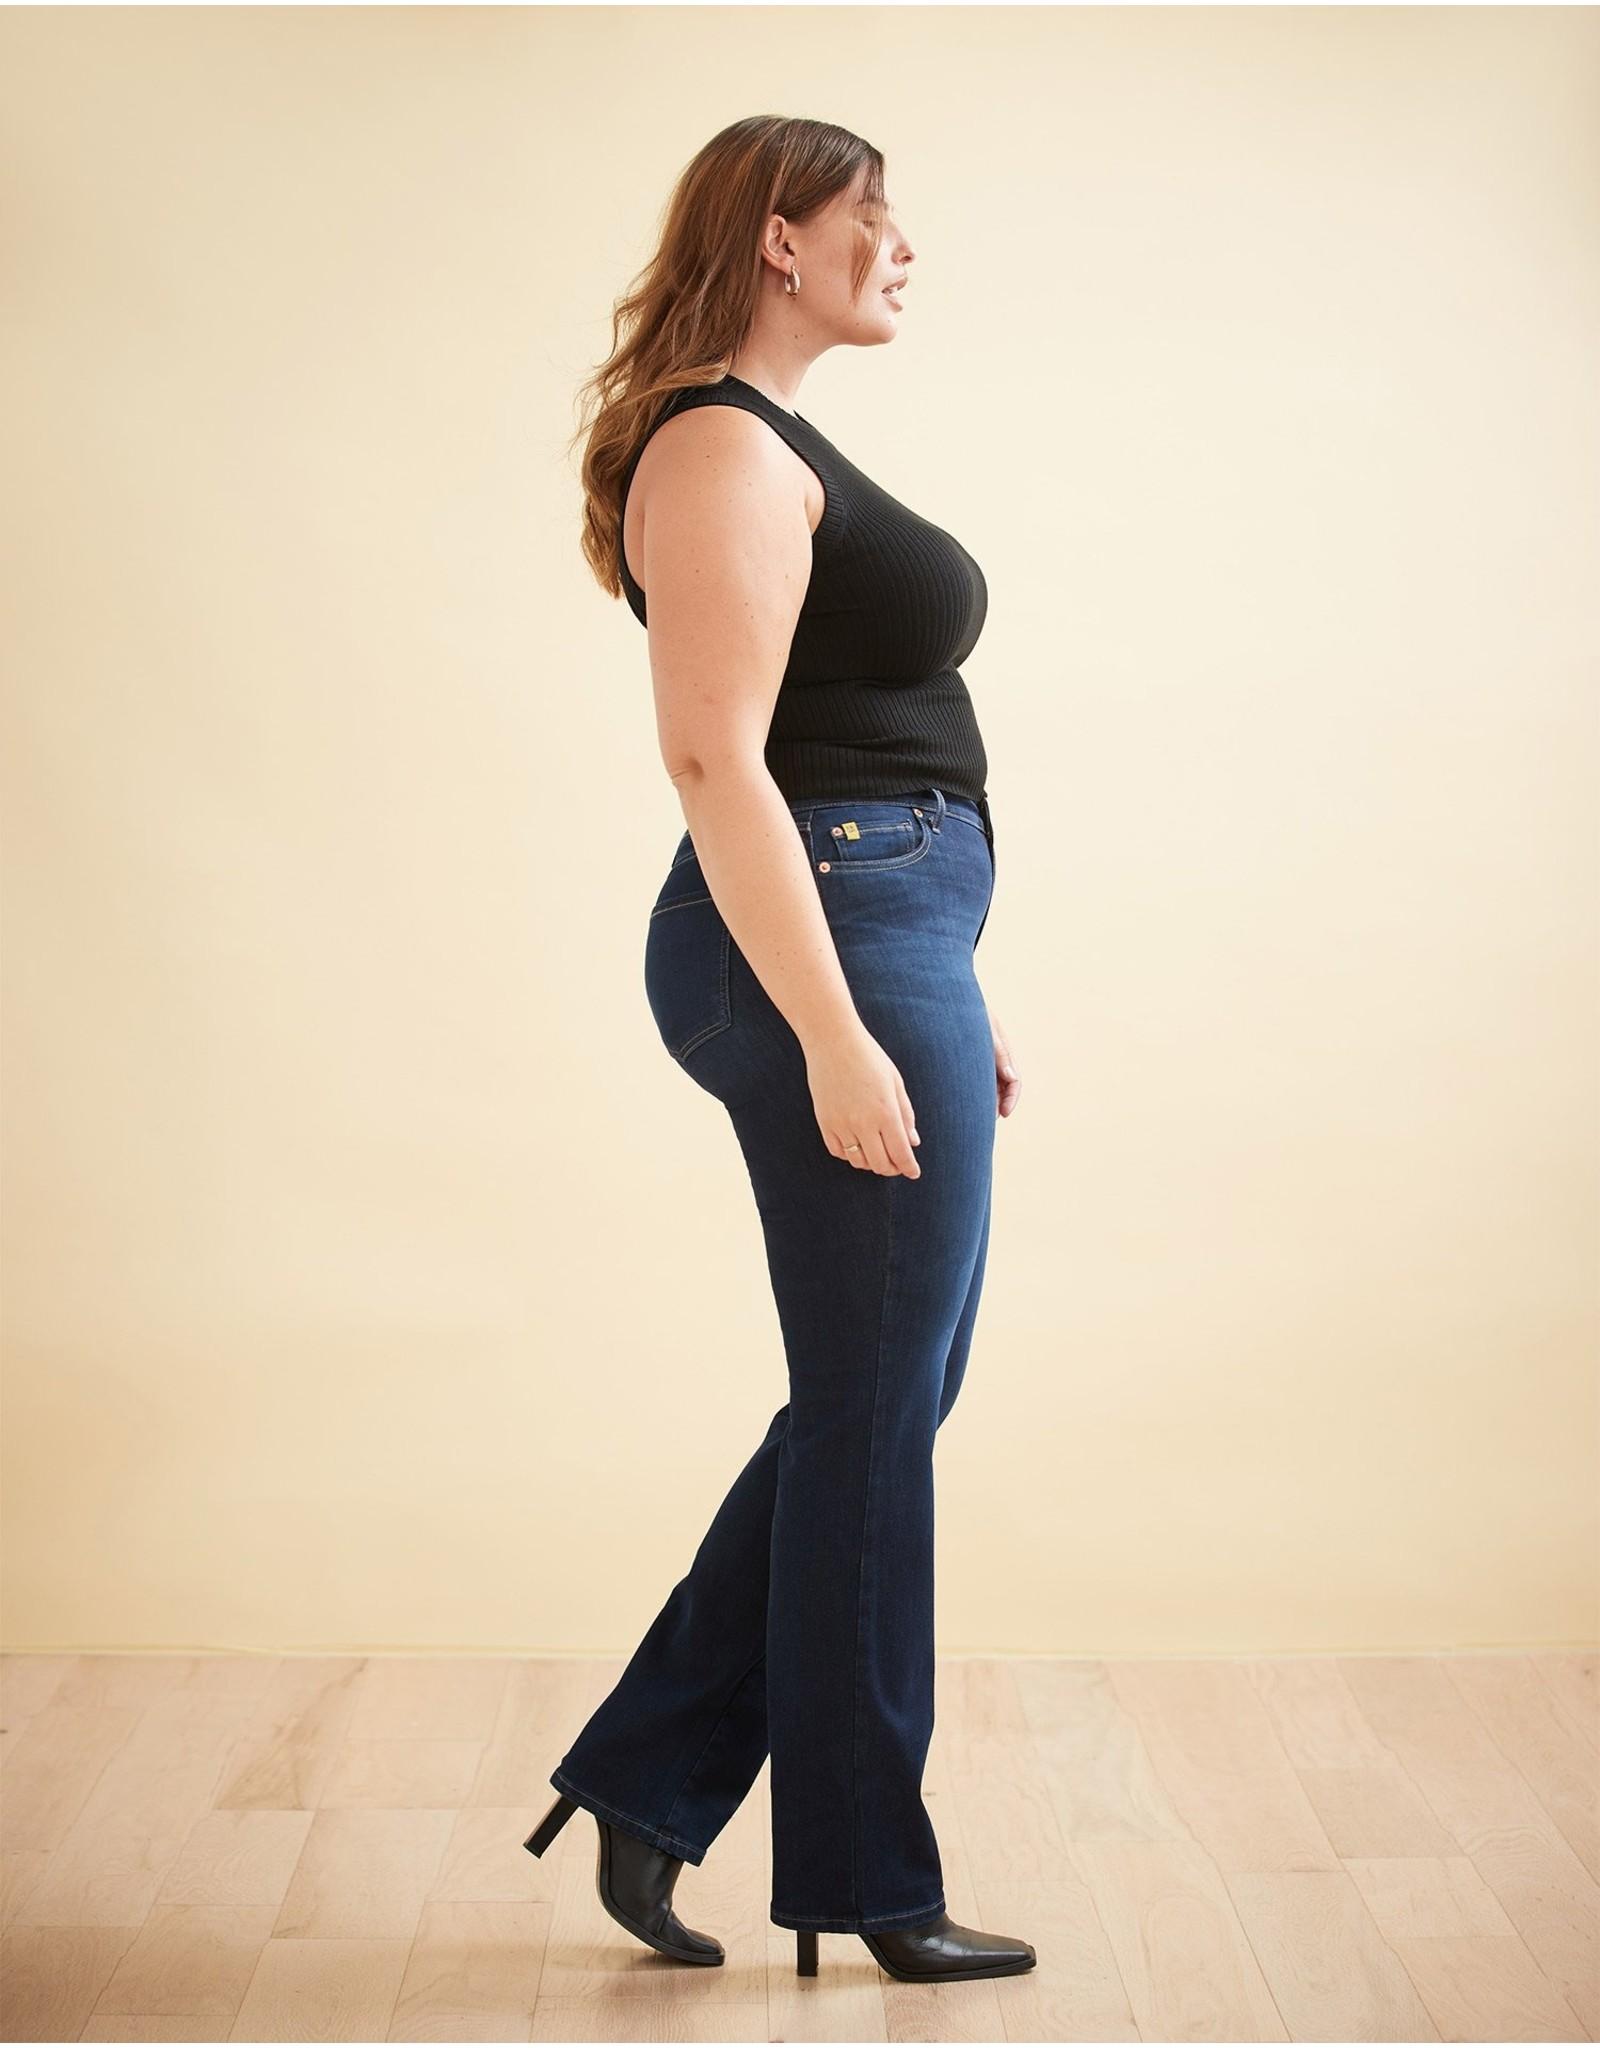 Yoga Jeans  Chloé Indie